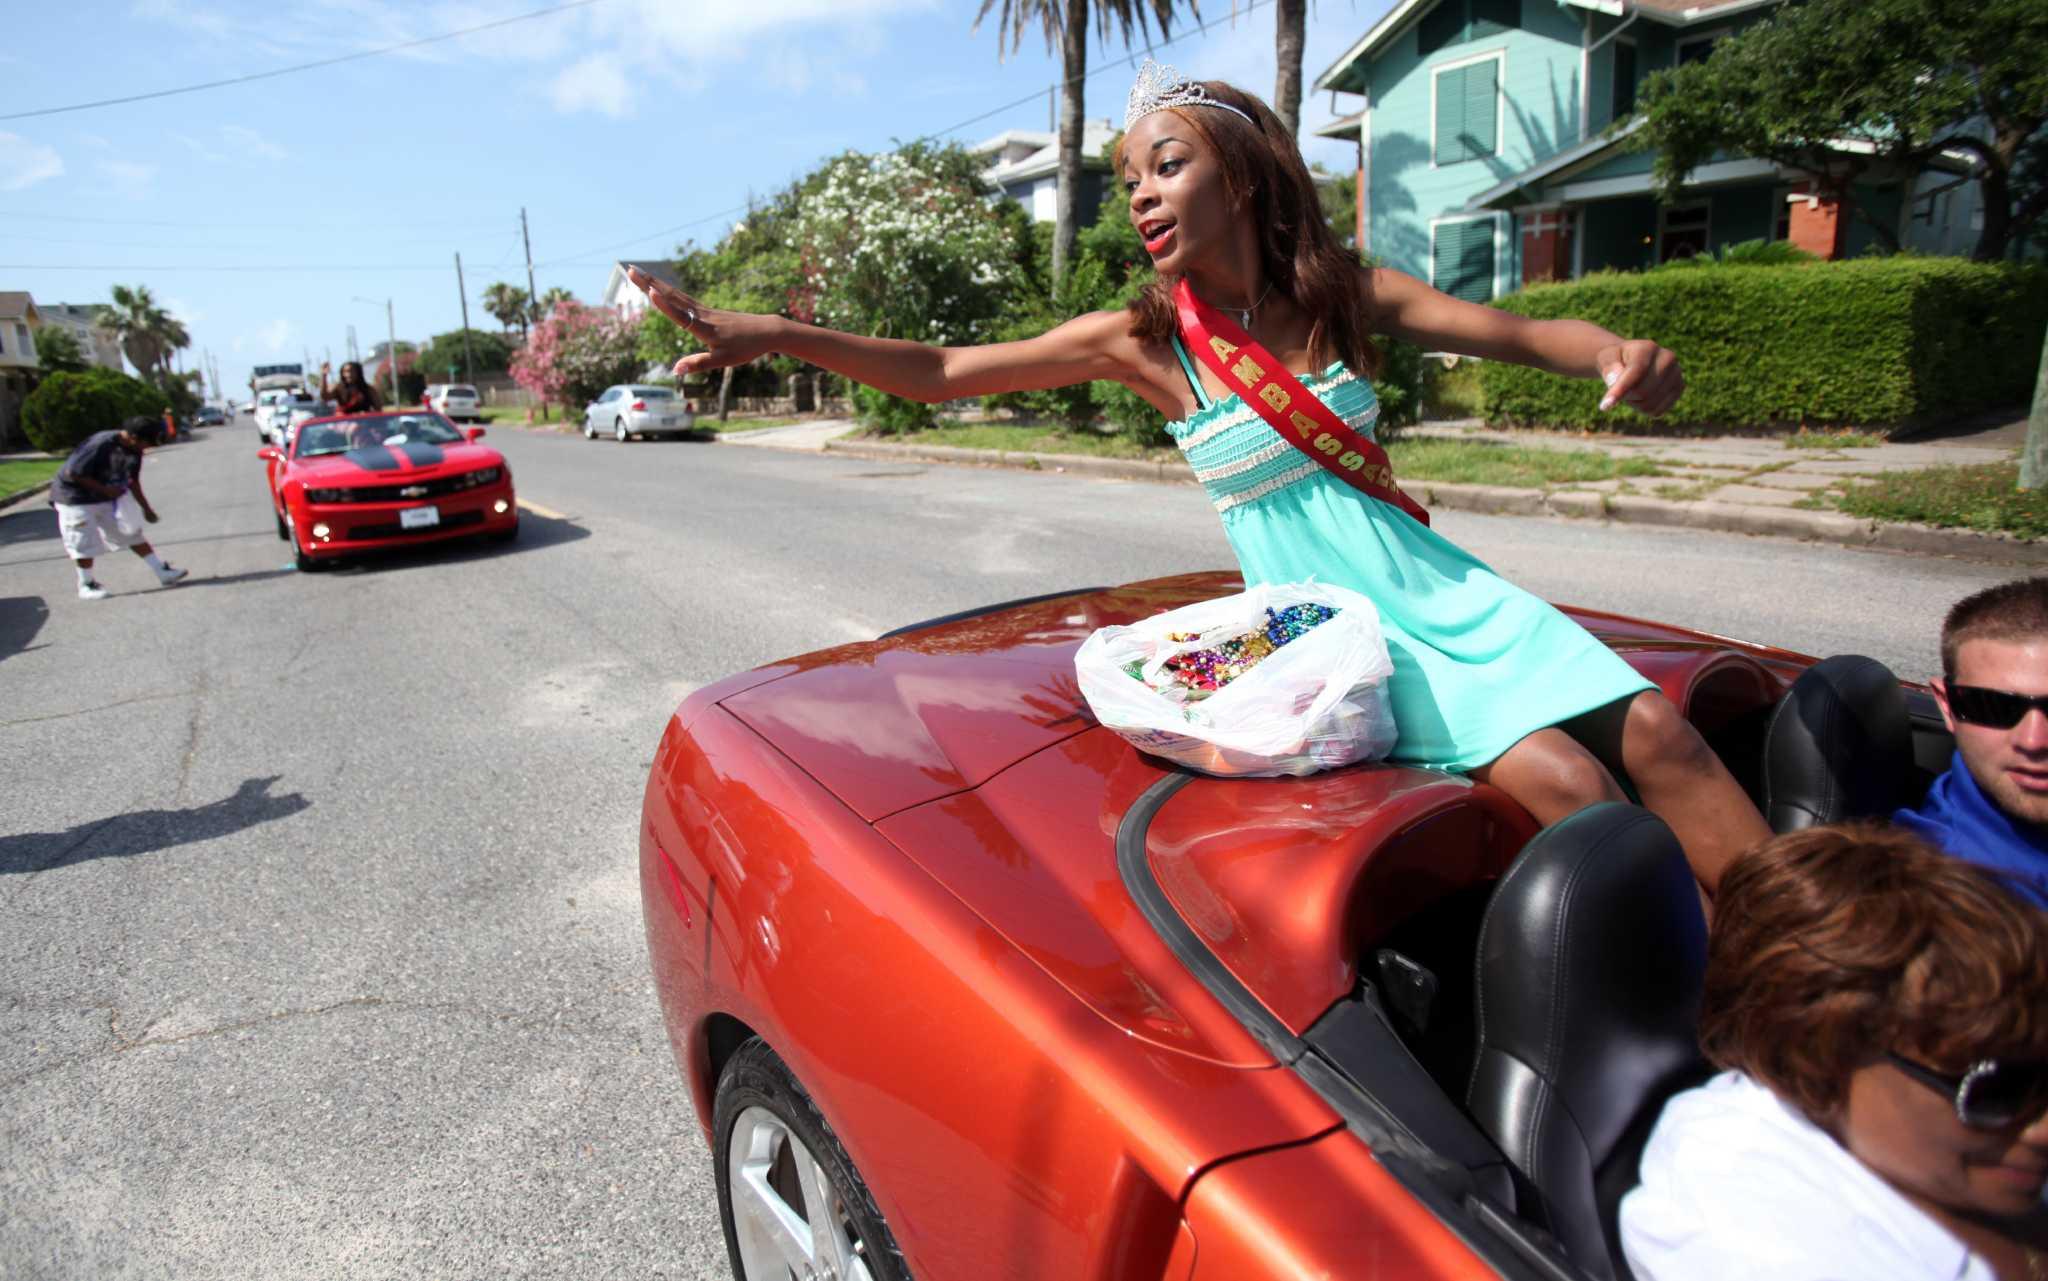 Image result for Juneteenth Celebration Parade in Galveston